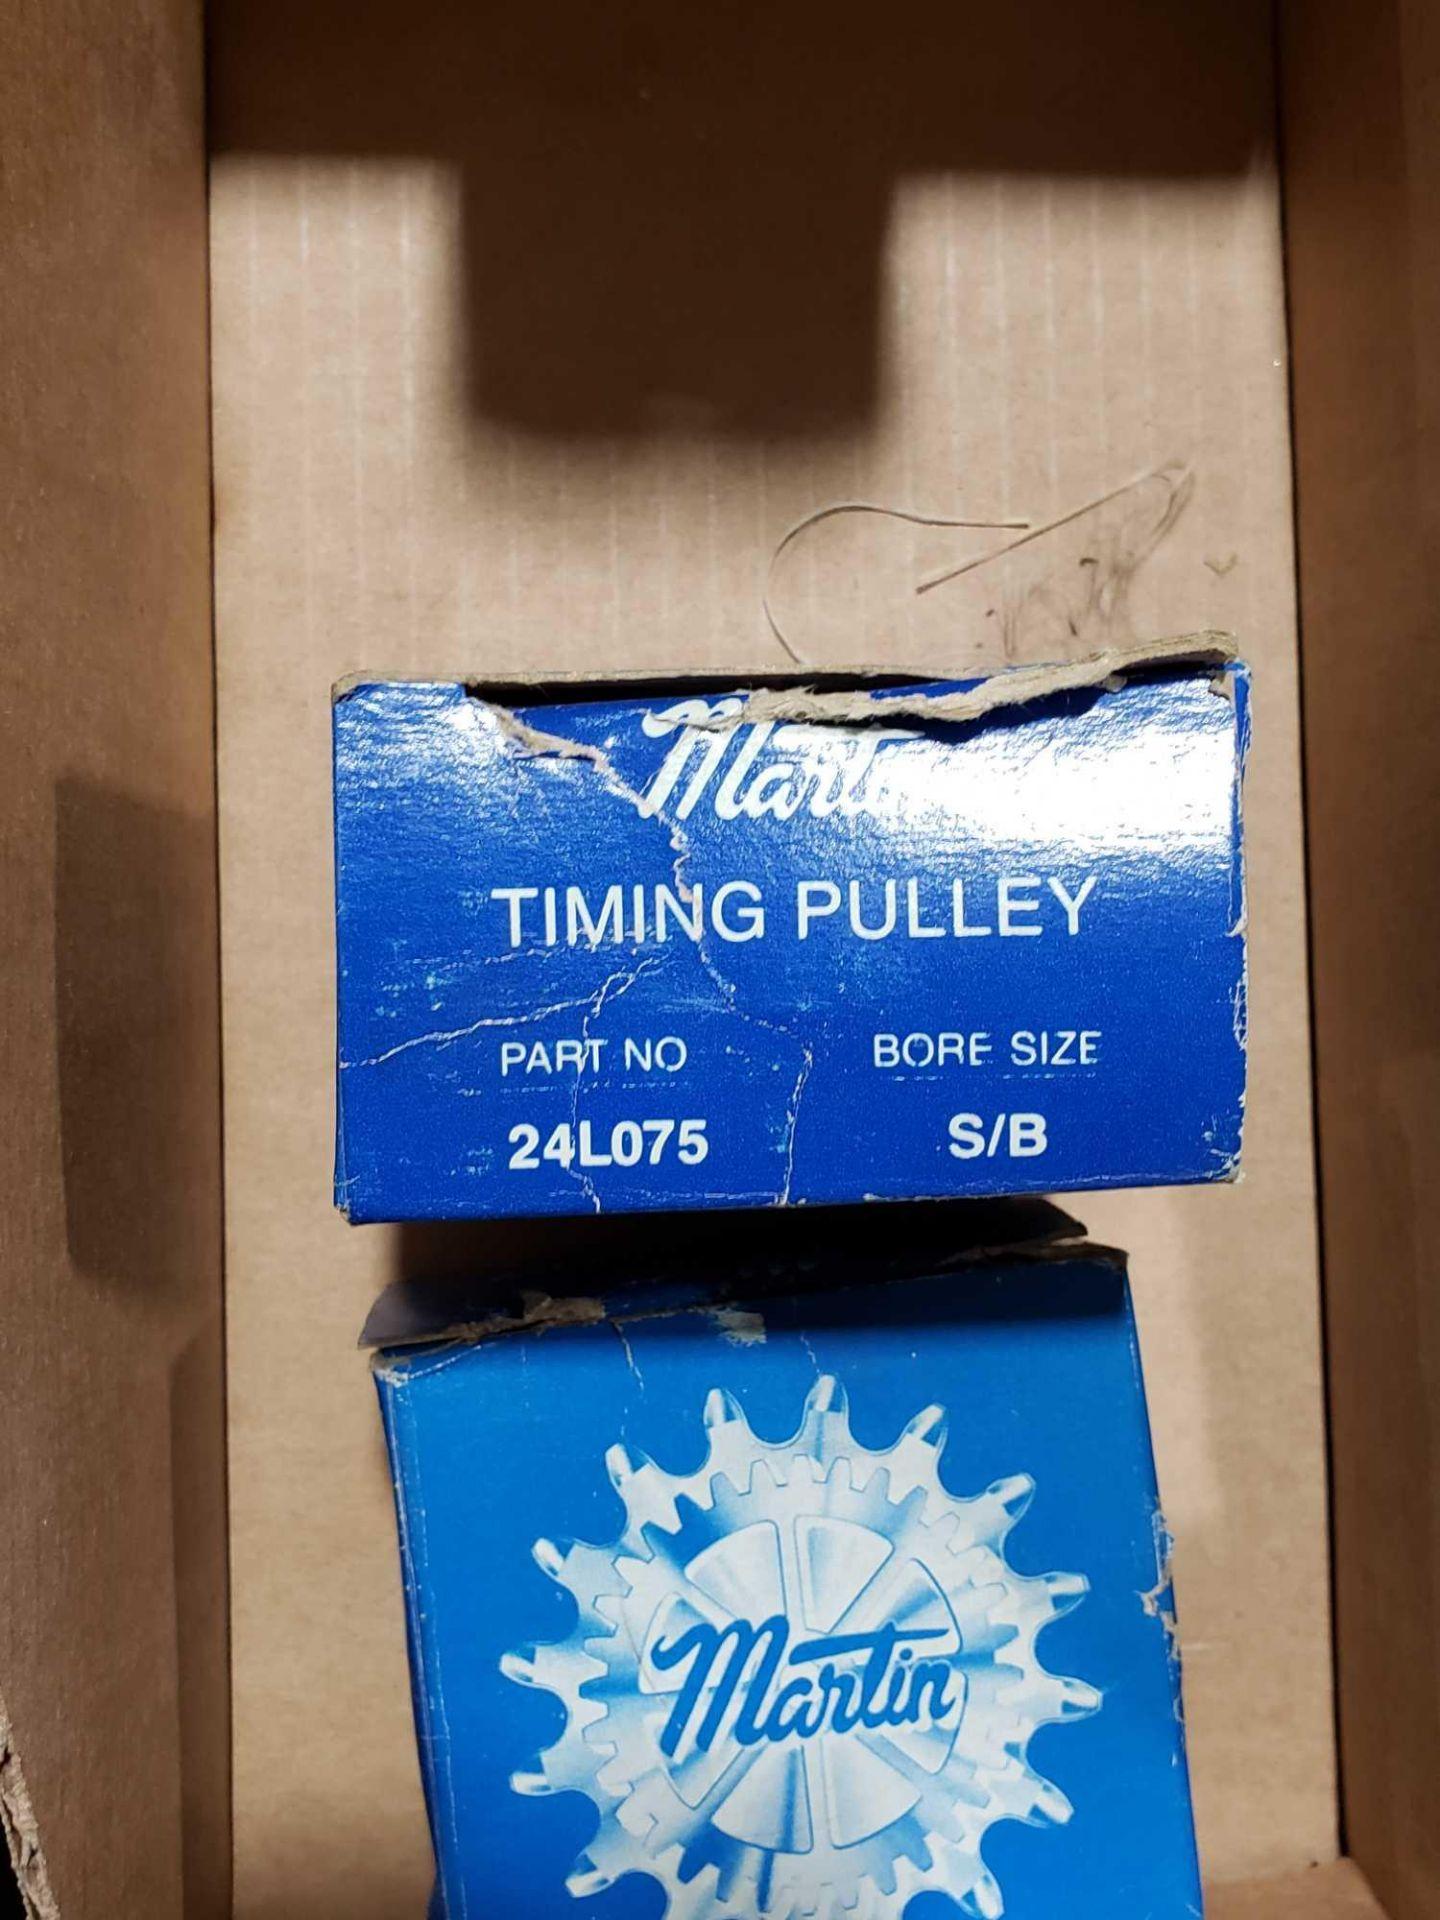 Lot 17 - Qty 2 - Martin timing pulley model 24L075. New in box.